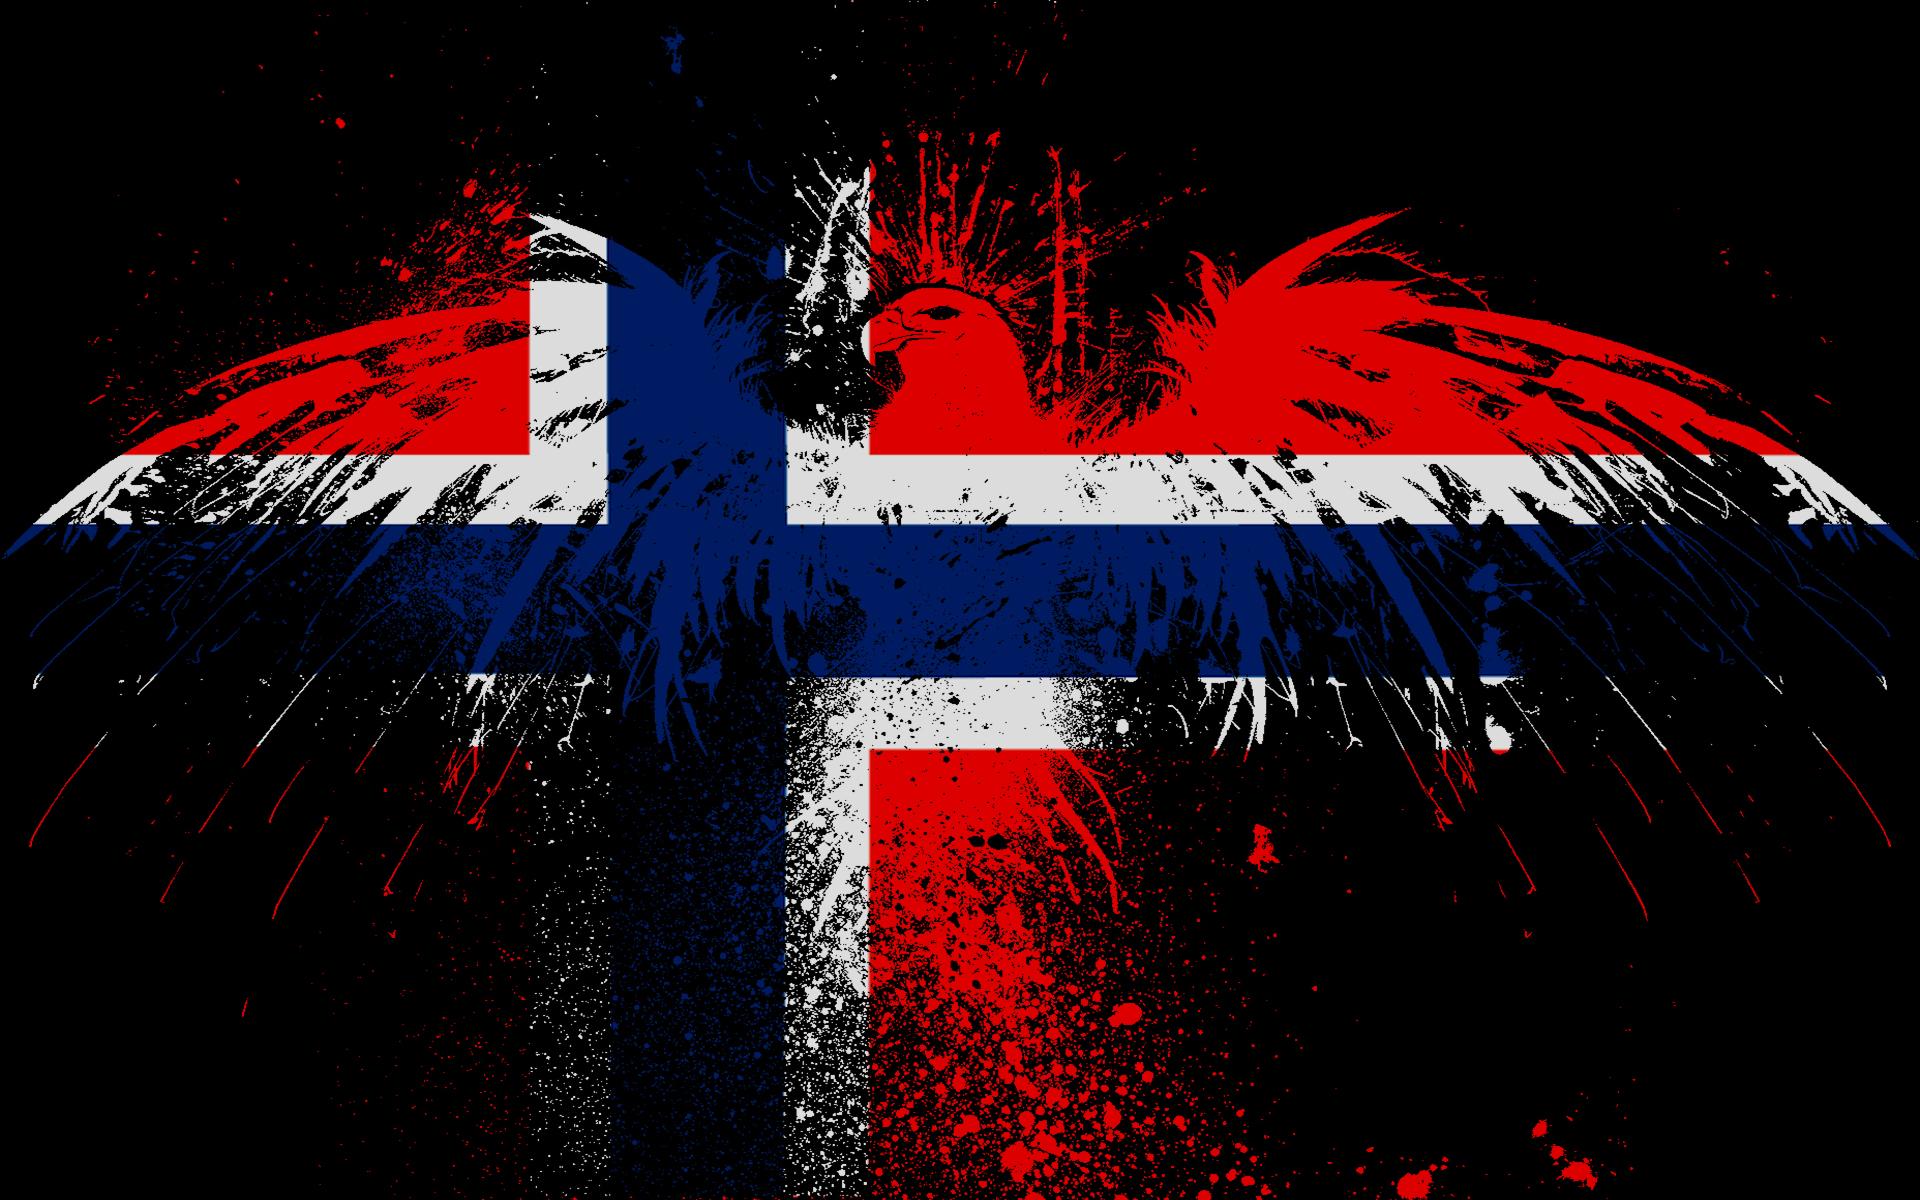 norwegian_eagles_norway_flags_flag_eagle_desktop_1920x1200_hd-wallpaper-663669.jpg